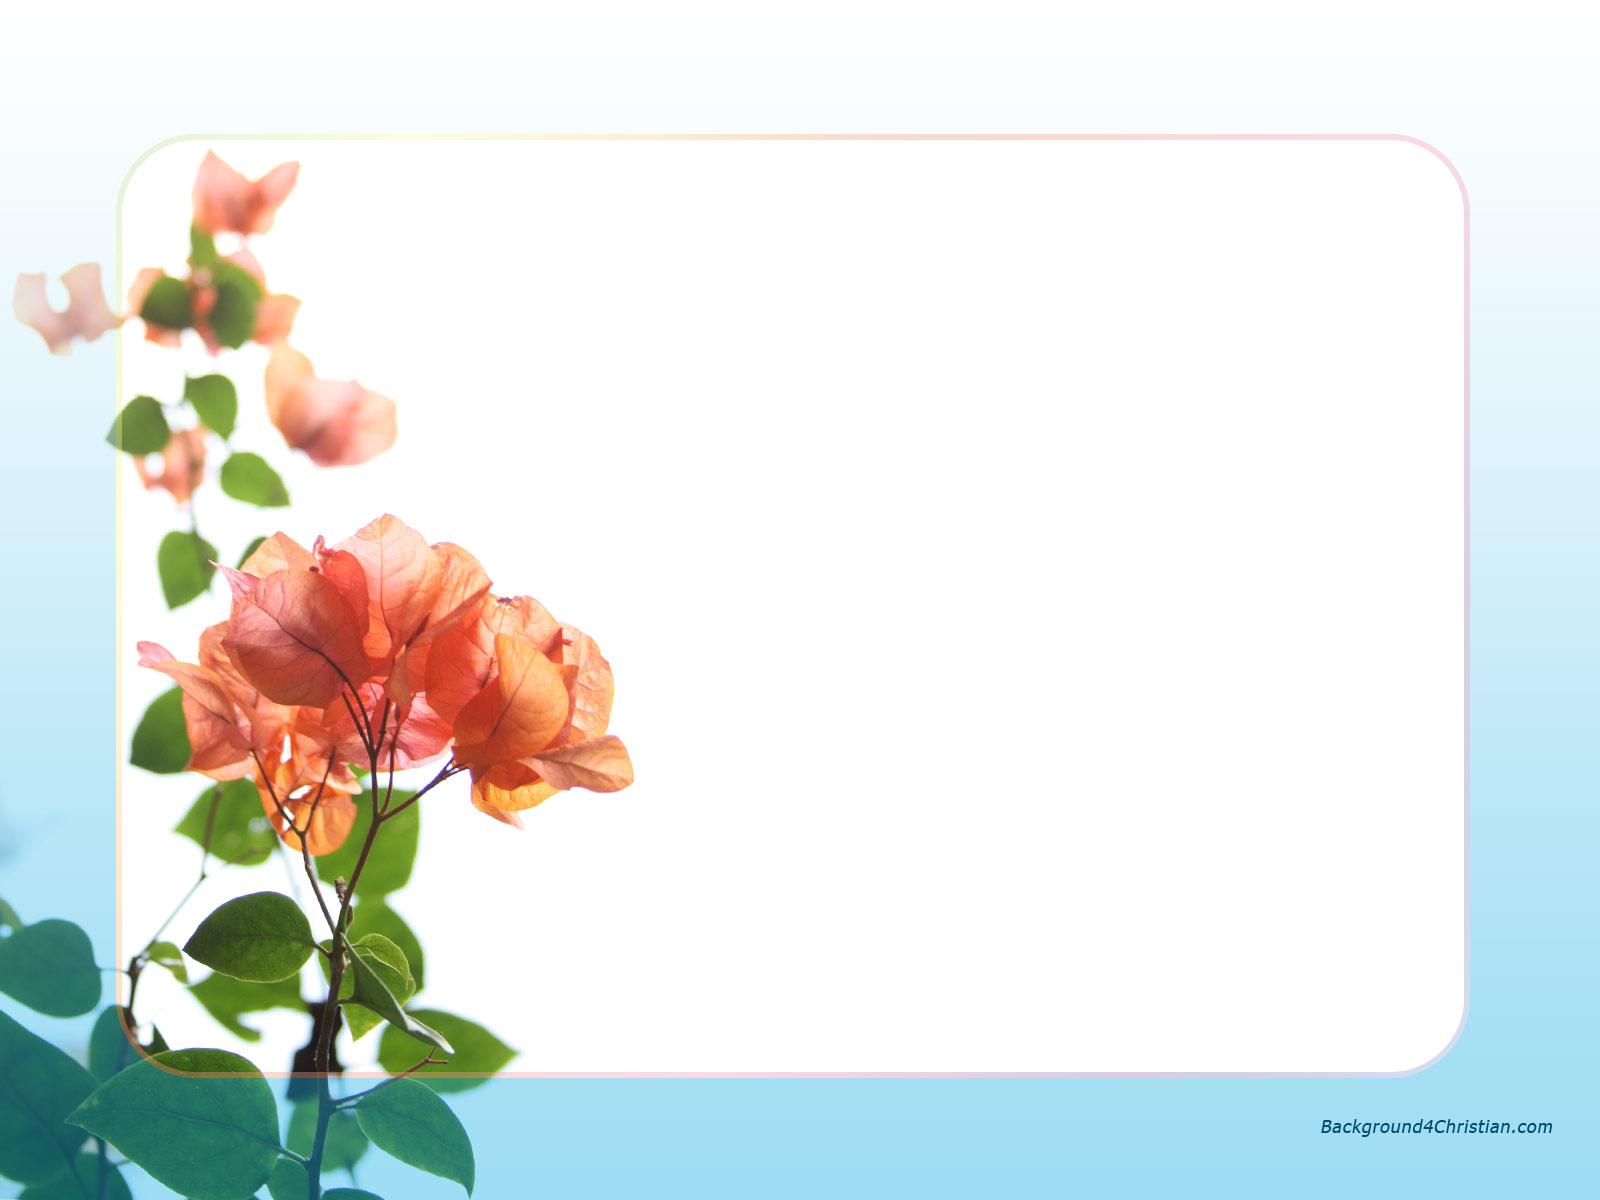 Wallpaper And Borders Download Wallpaper DaWallpaperz 1600x1200